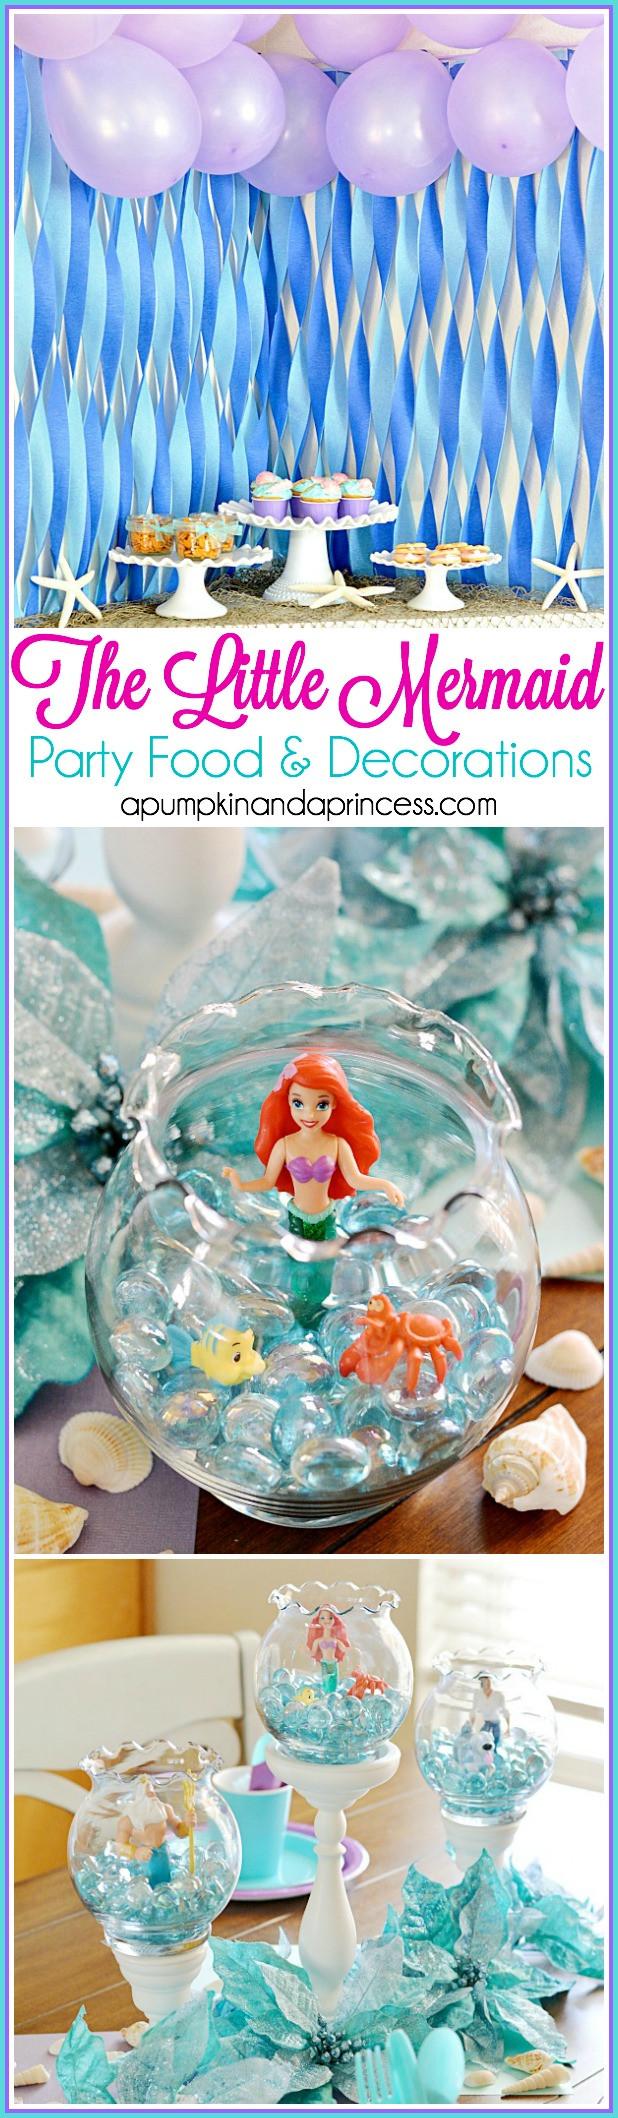 The Little Mermaid Party Ideas Pinterest  The Little Mermaid Party A Pumpkin And A Princess